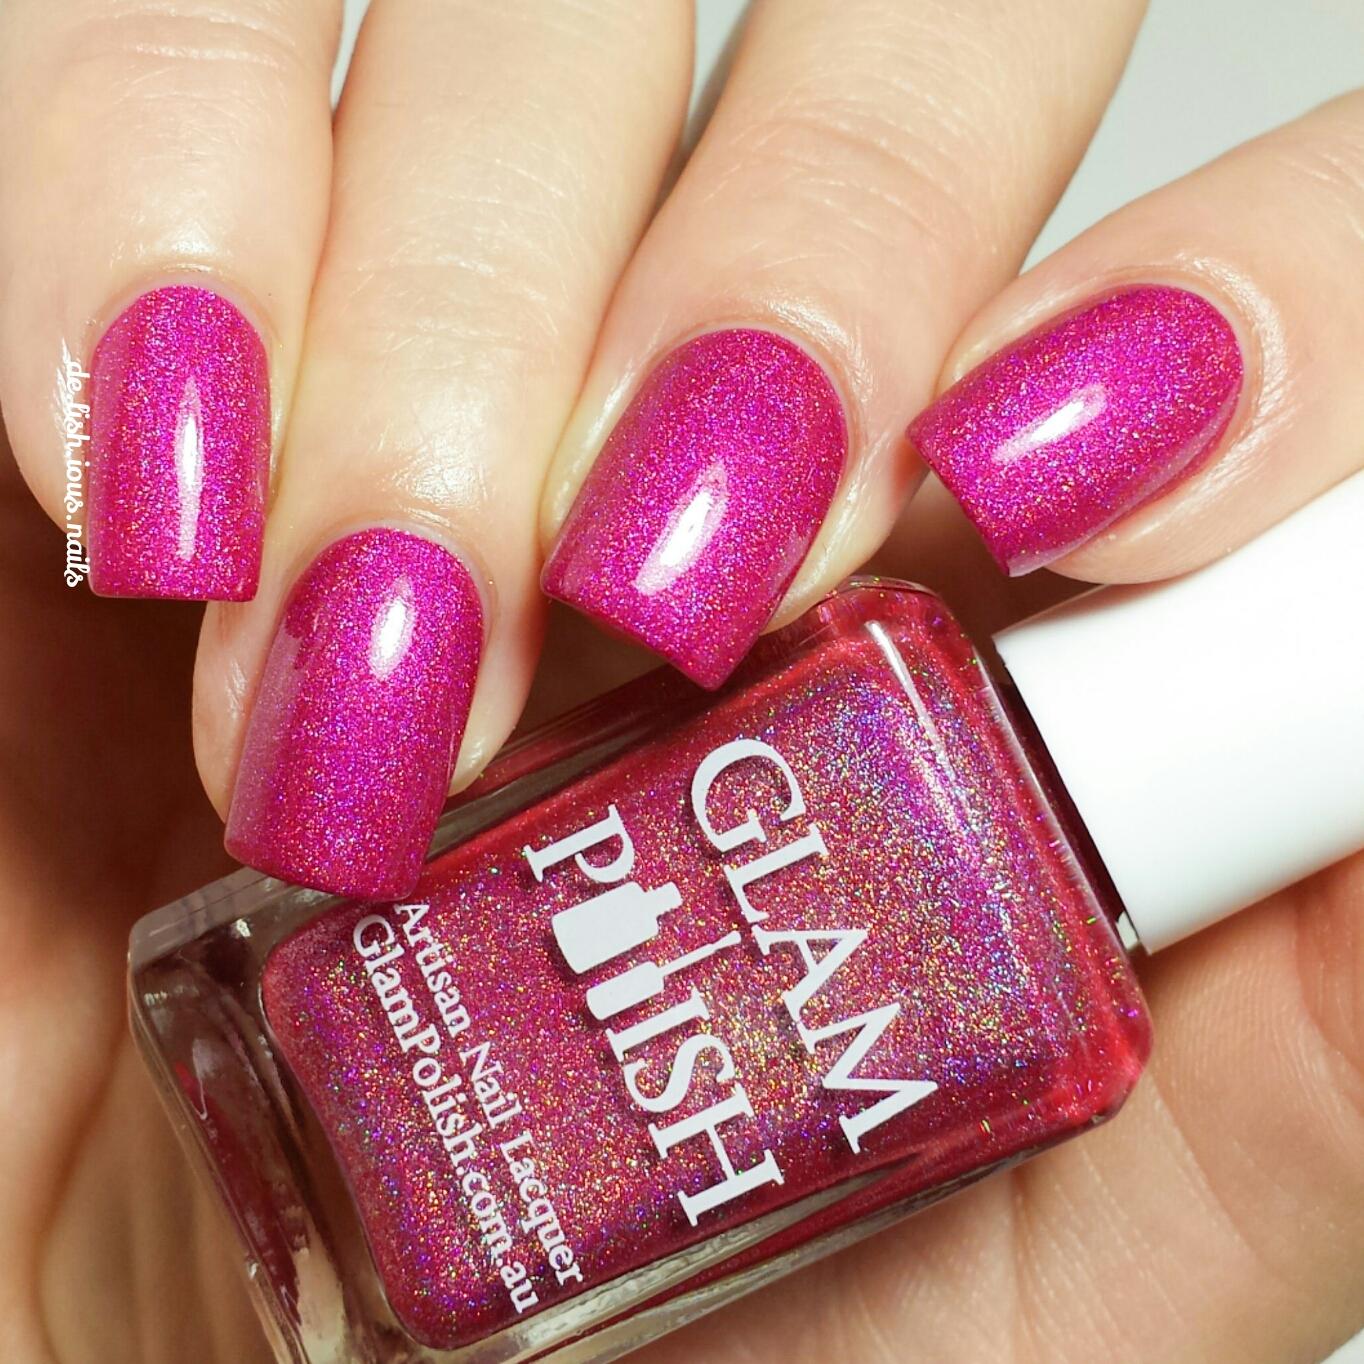 glam-polish-starlet-or-streetwalker-3.jpg.jpeg